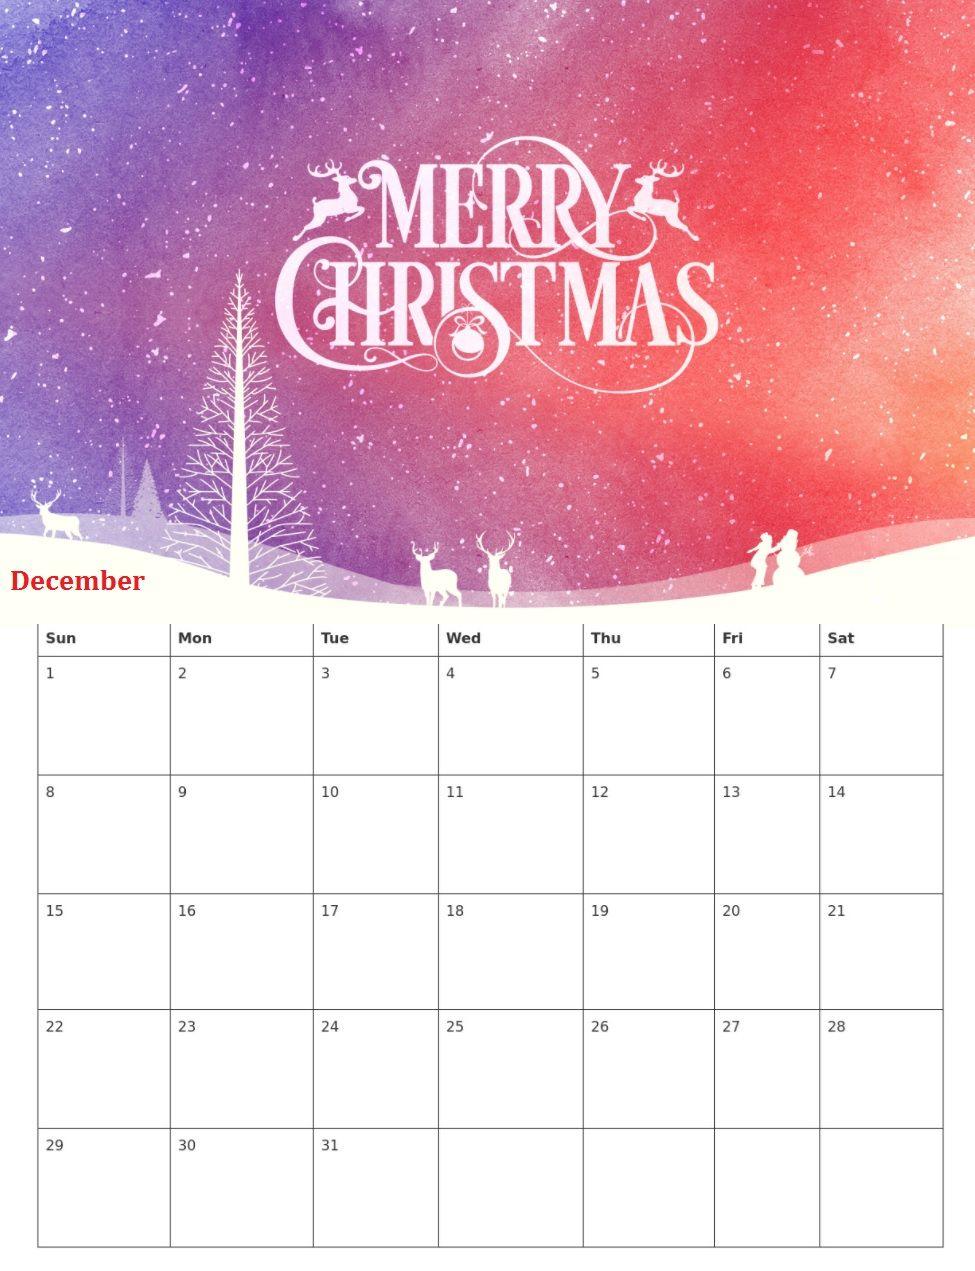 Christmas December 2019 Calendar Printable Cute December 2019 Christmas Calendar | Calendar 2018 | Christmas